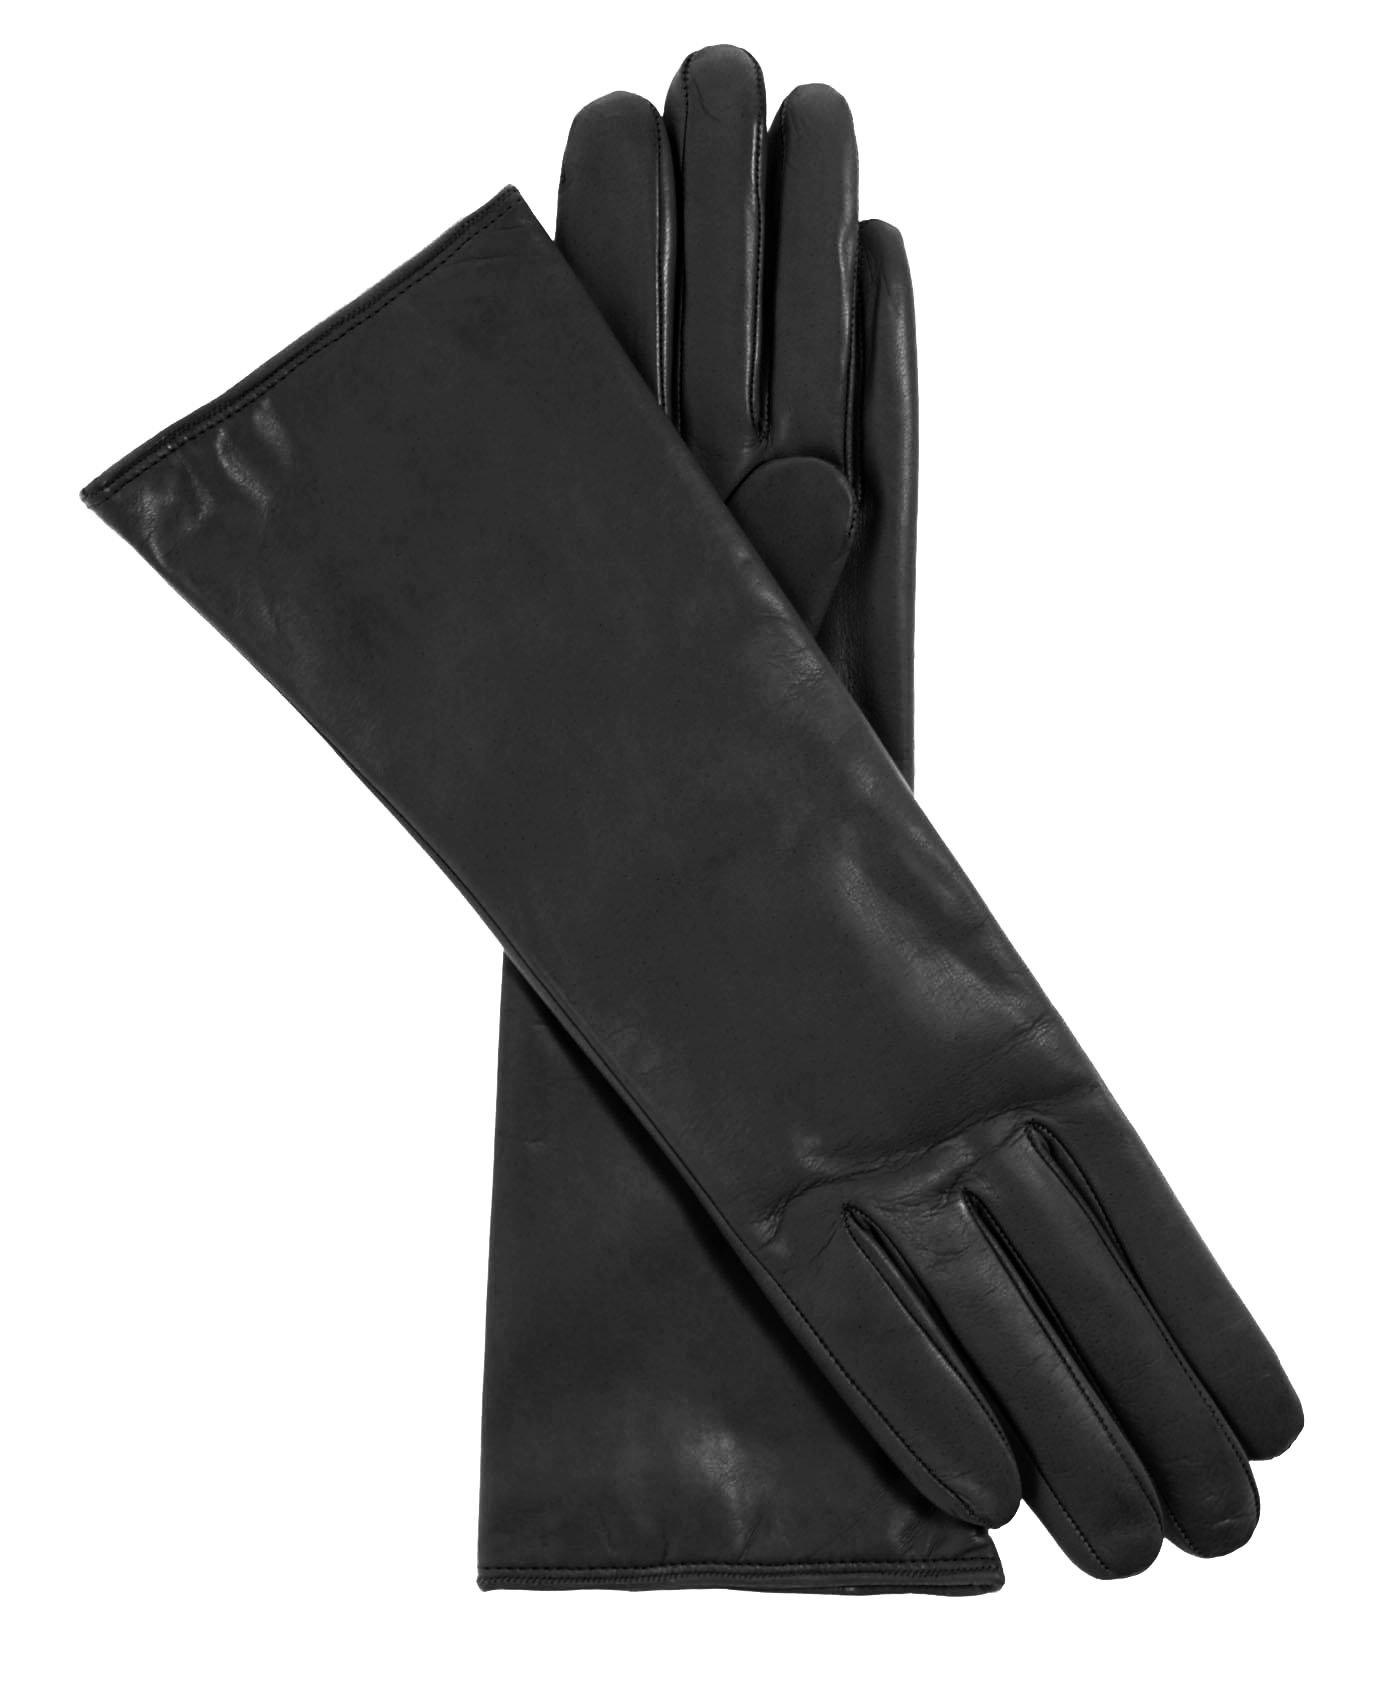 Fratelli Orsini Women's Italian''4 Button Length'' Cashmere Lined Leather Gloves Size 8 1/2 Color Black by Fratelli Orsini (Image #3)